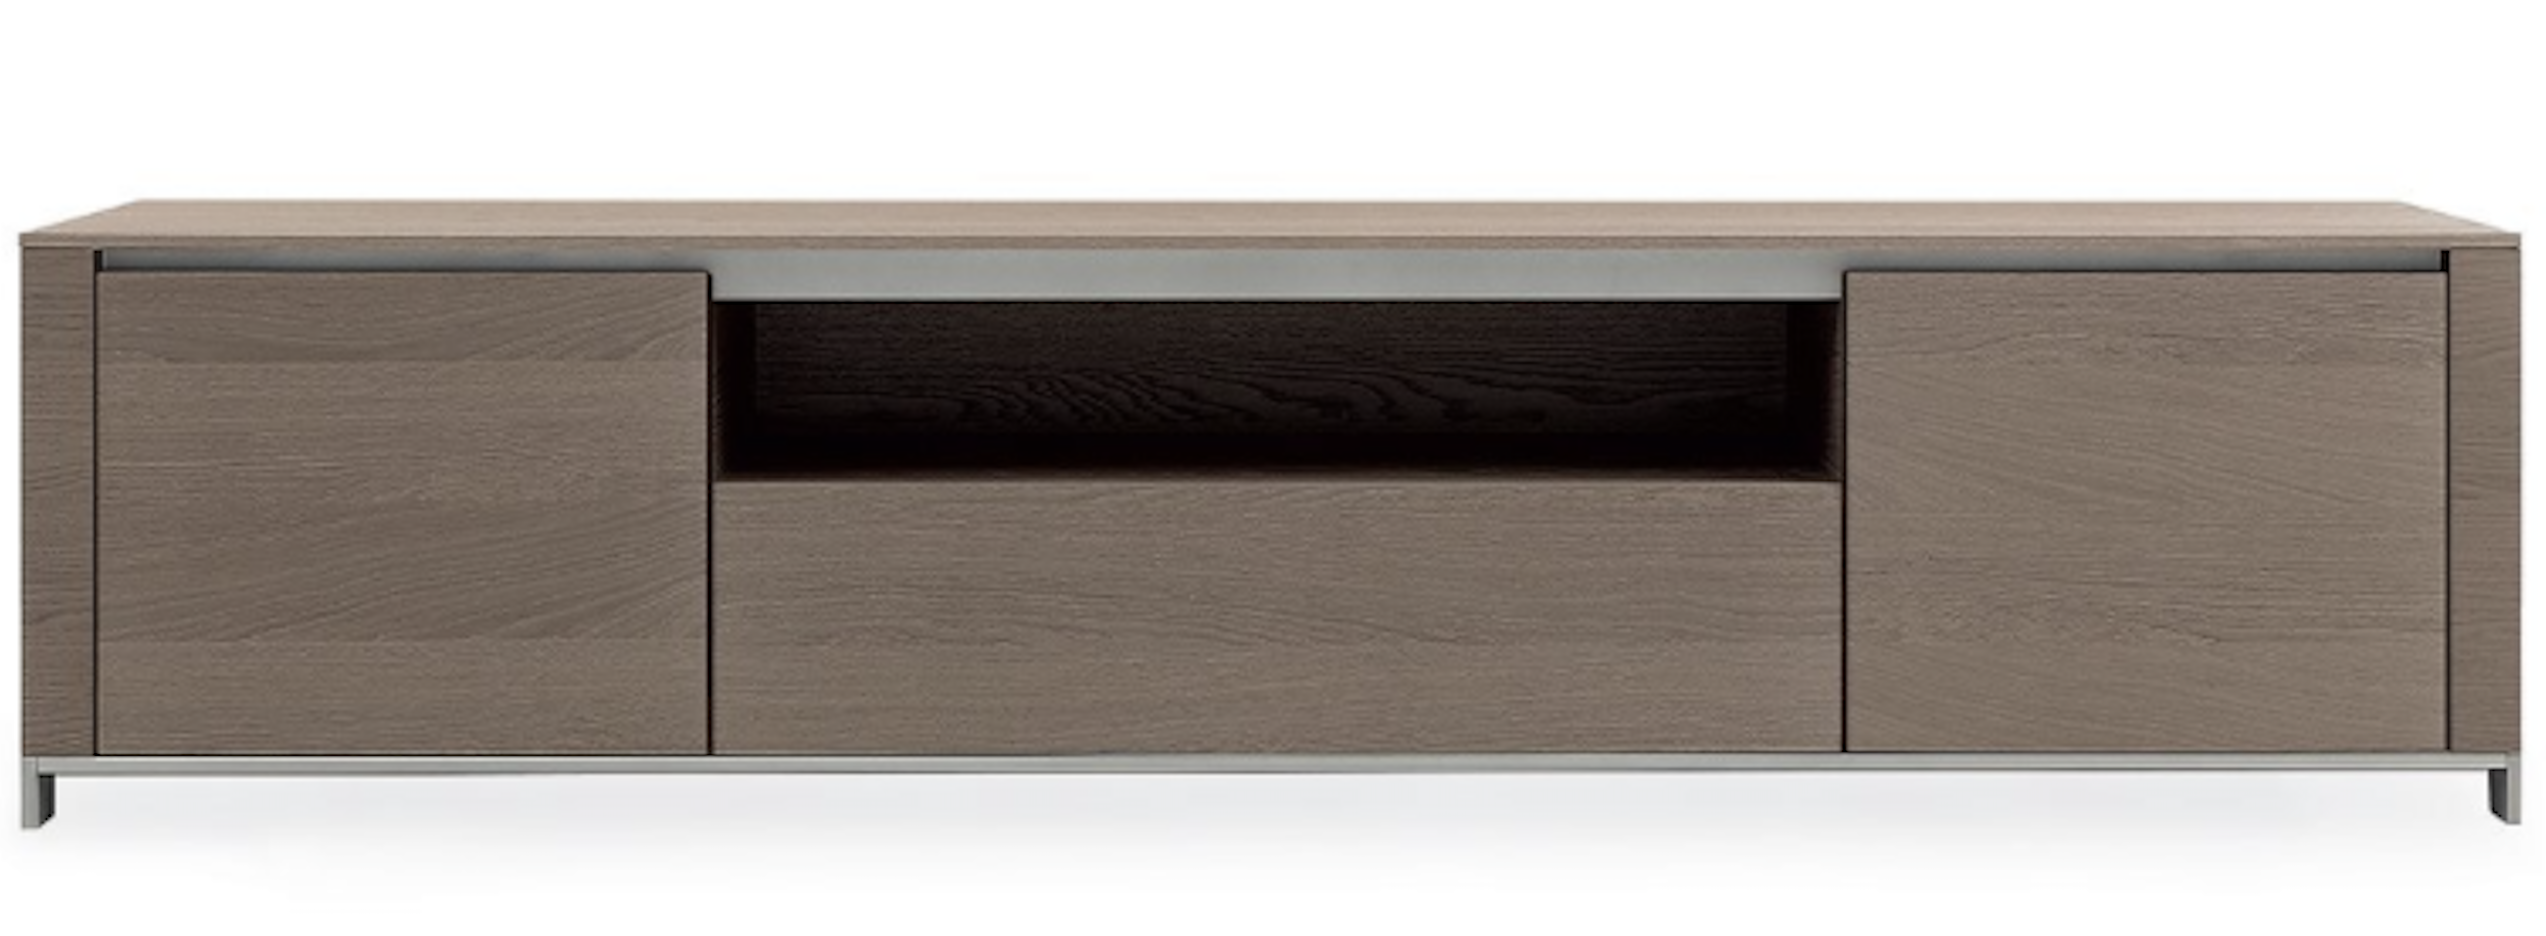 Product Image Febe sideboard